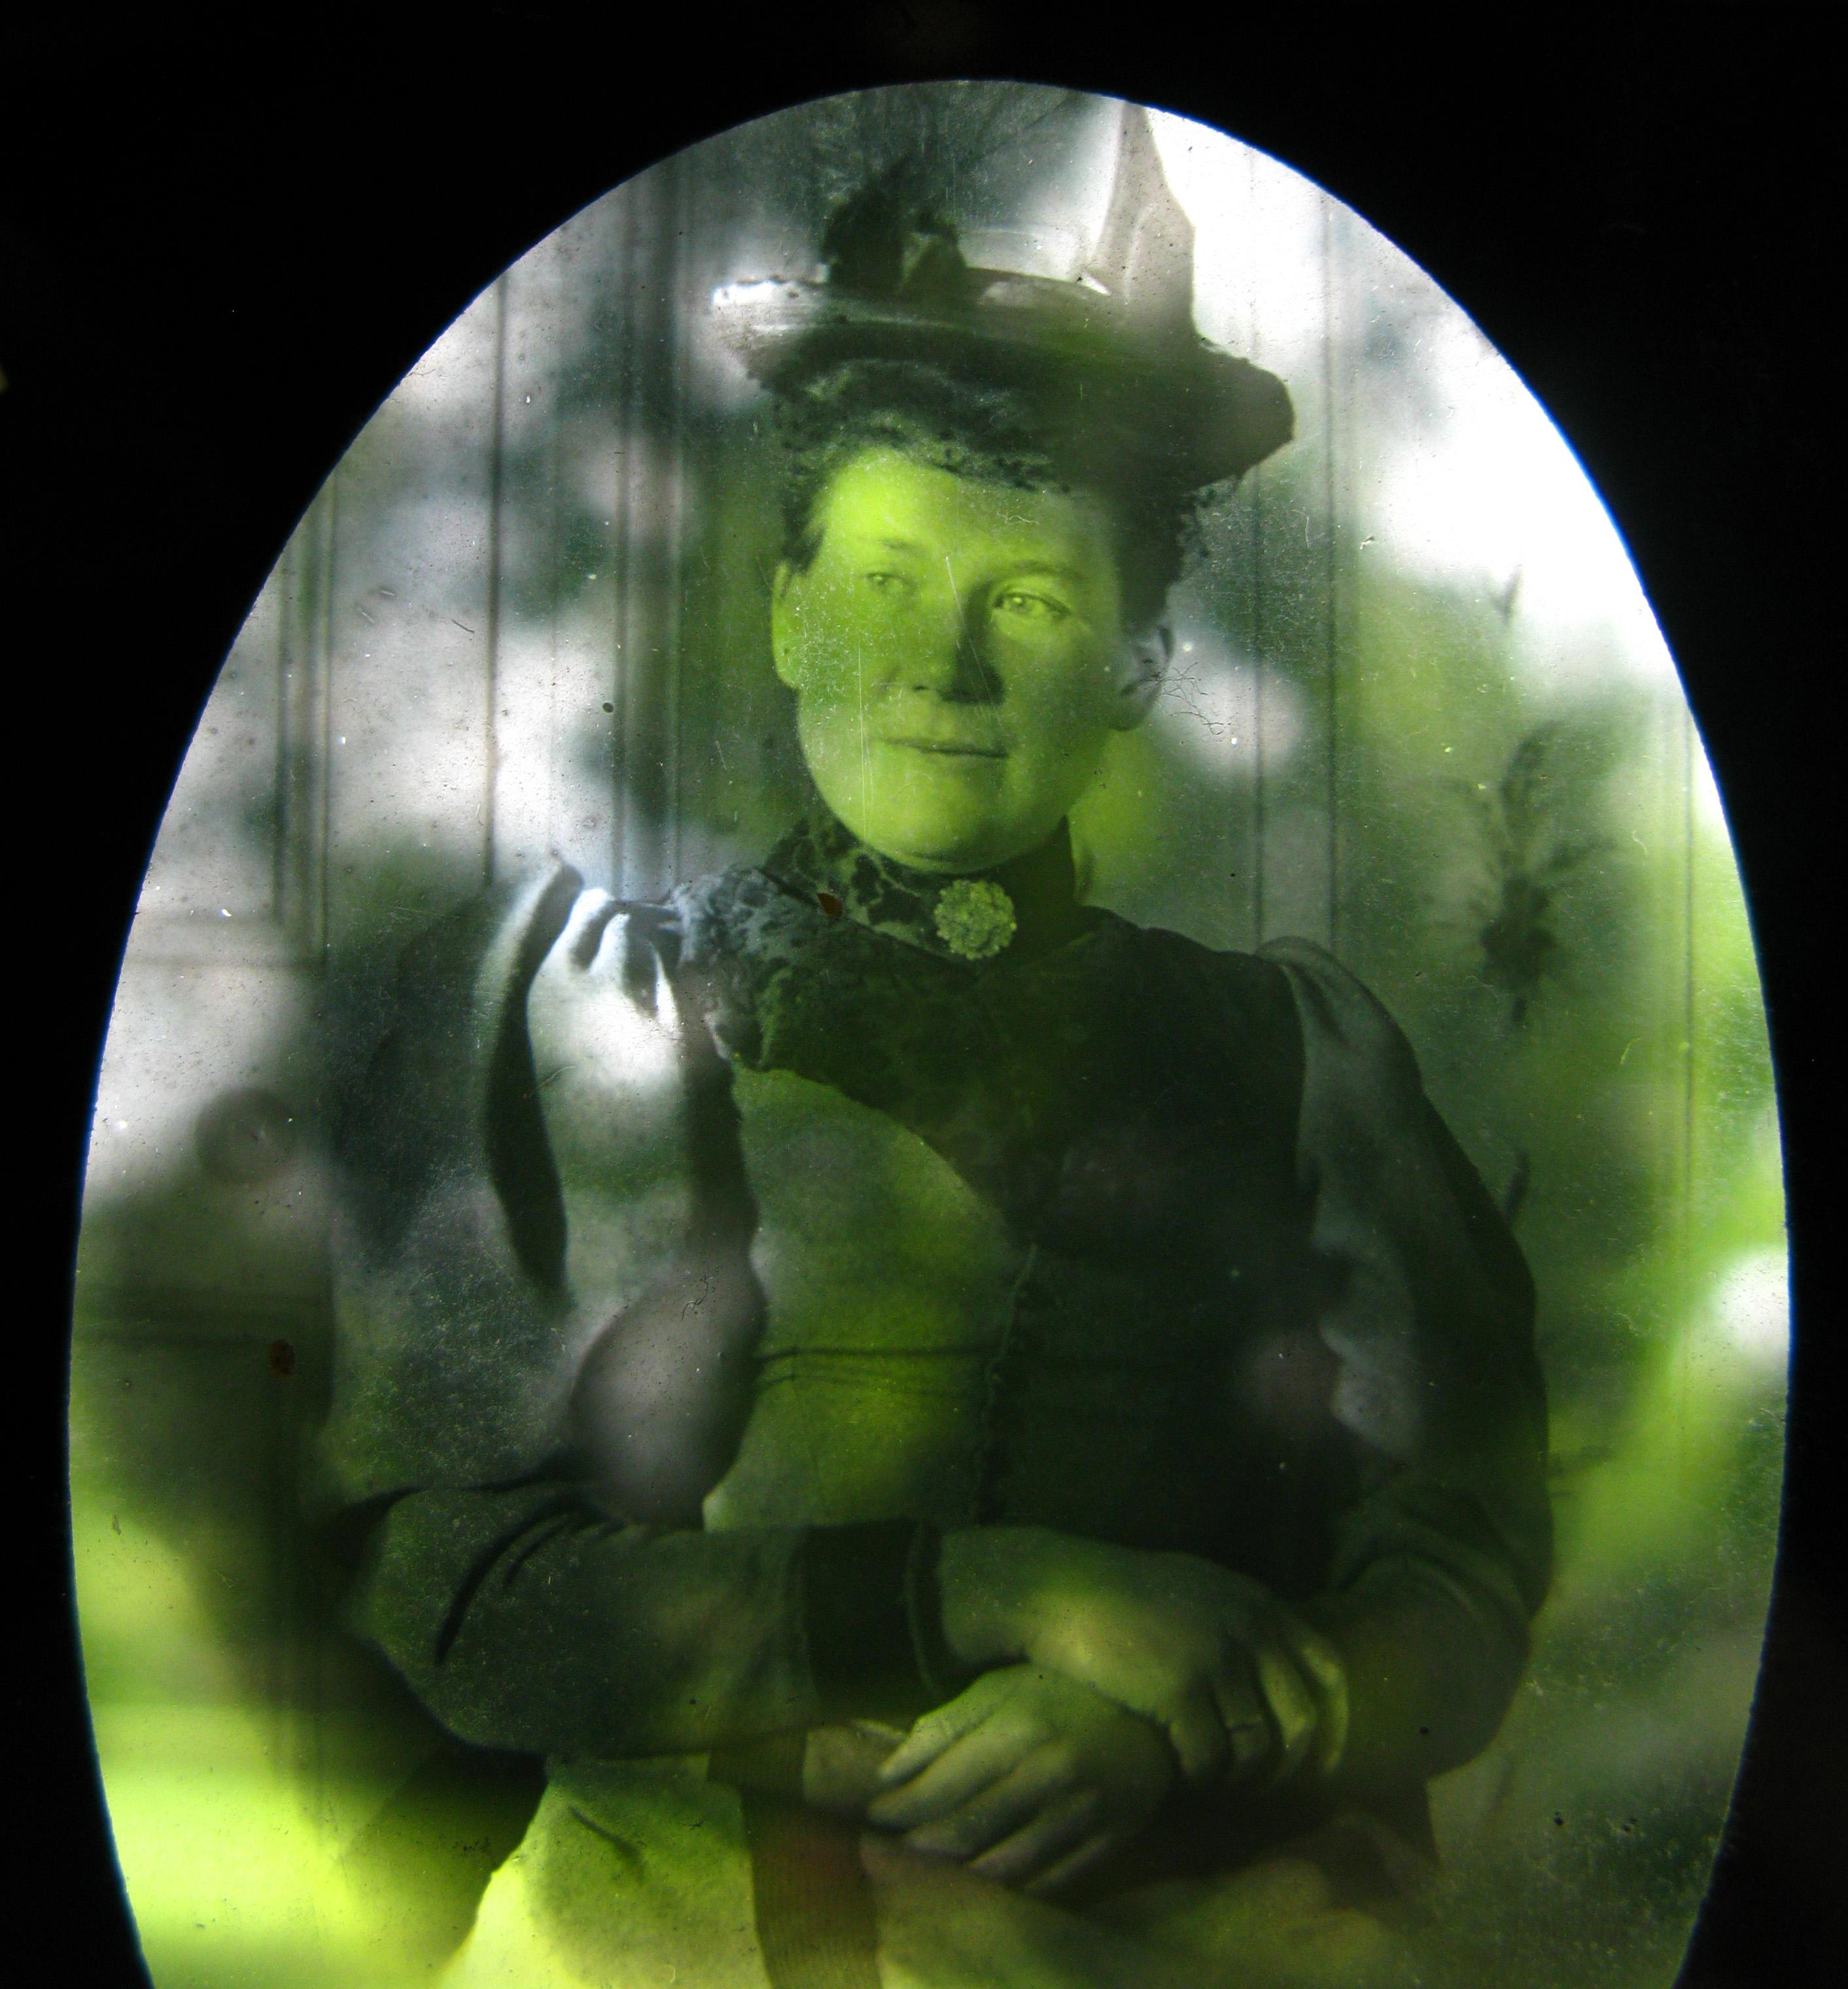 Victorian magic lantern slide